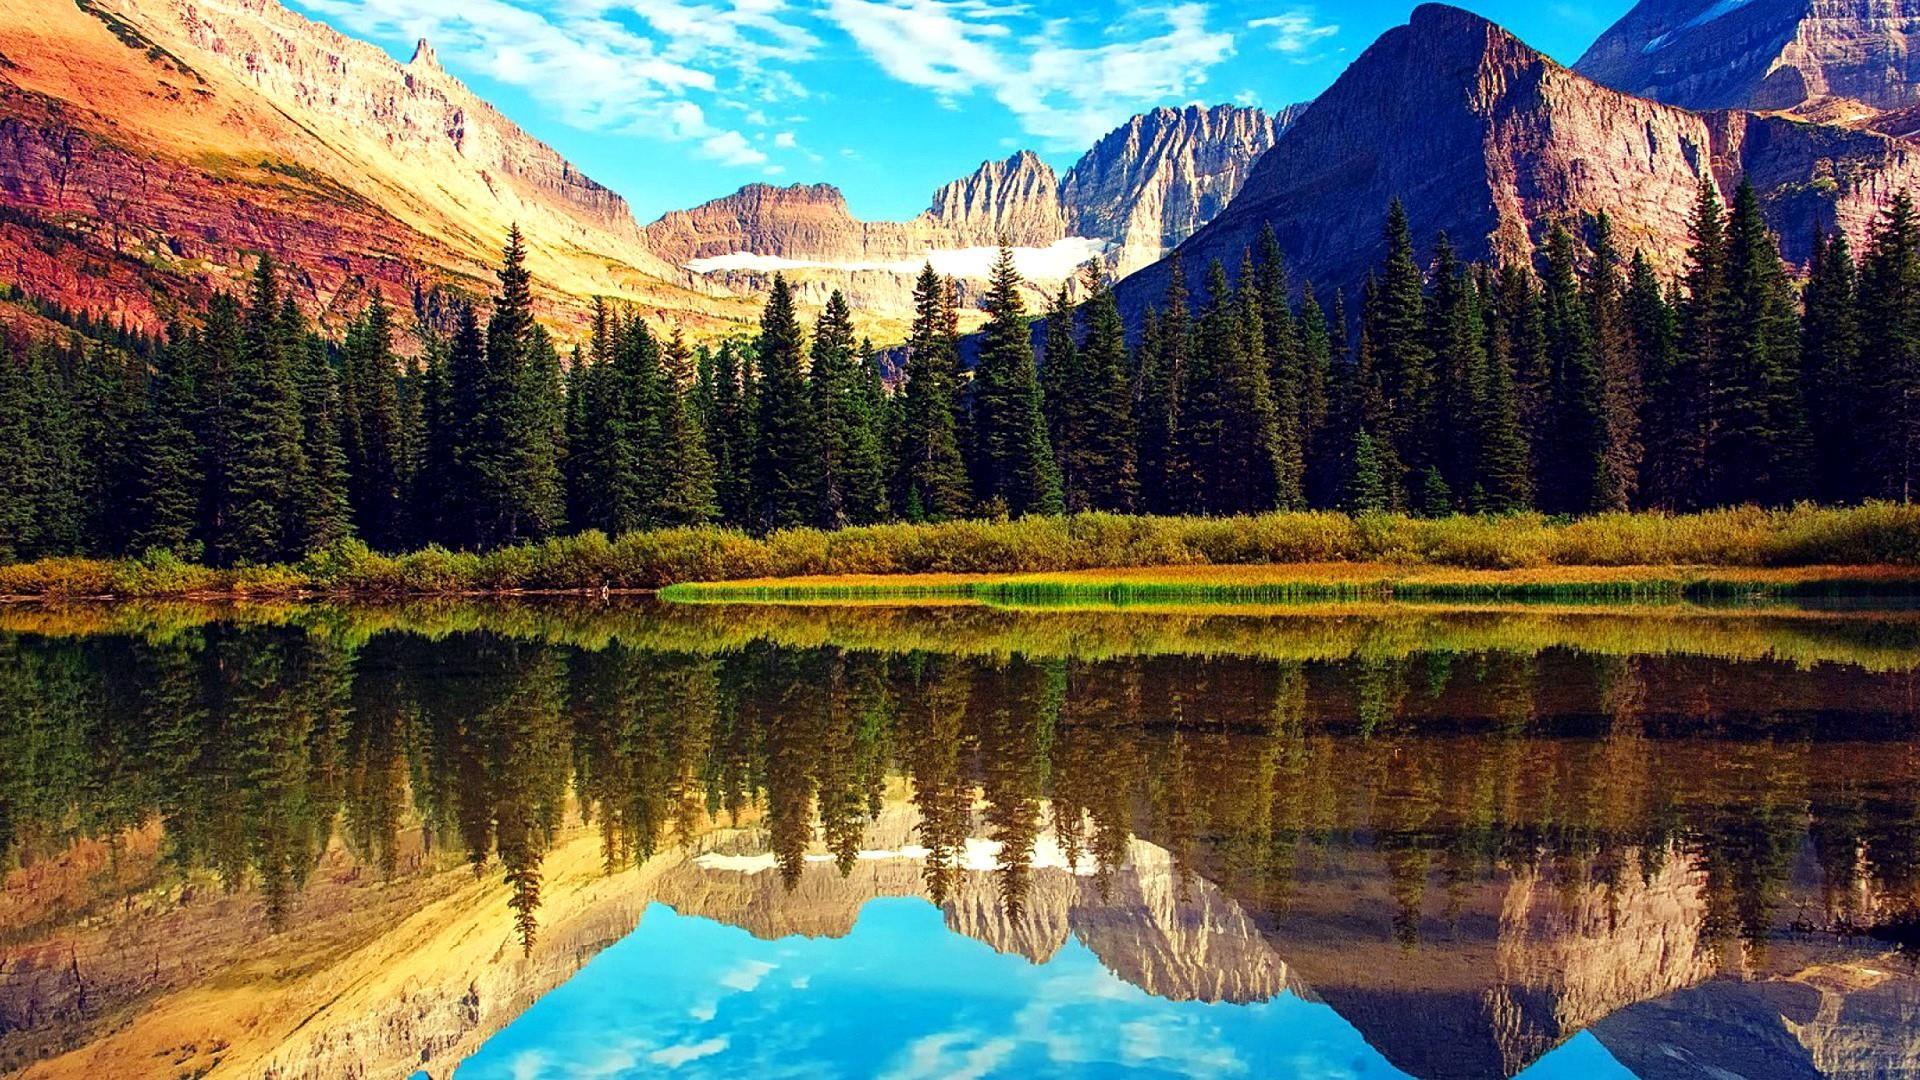 Download Glacier National Park Hd 1970653 Hd Wallpaper